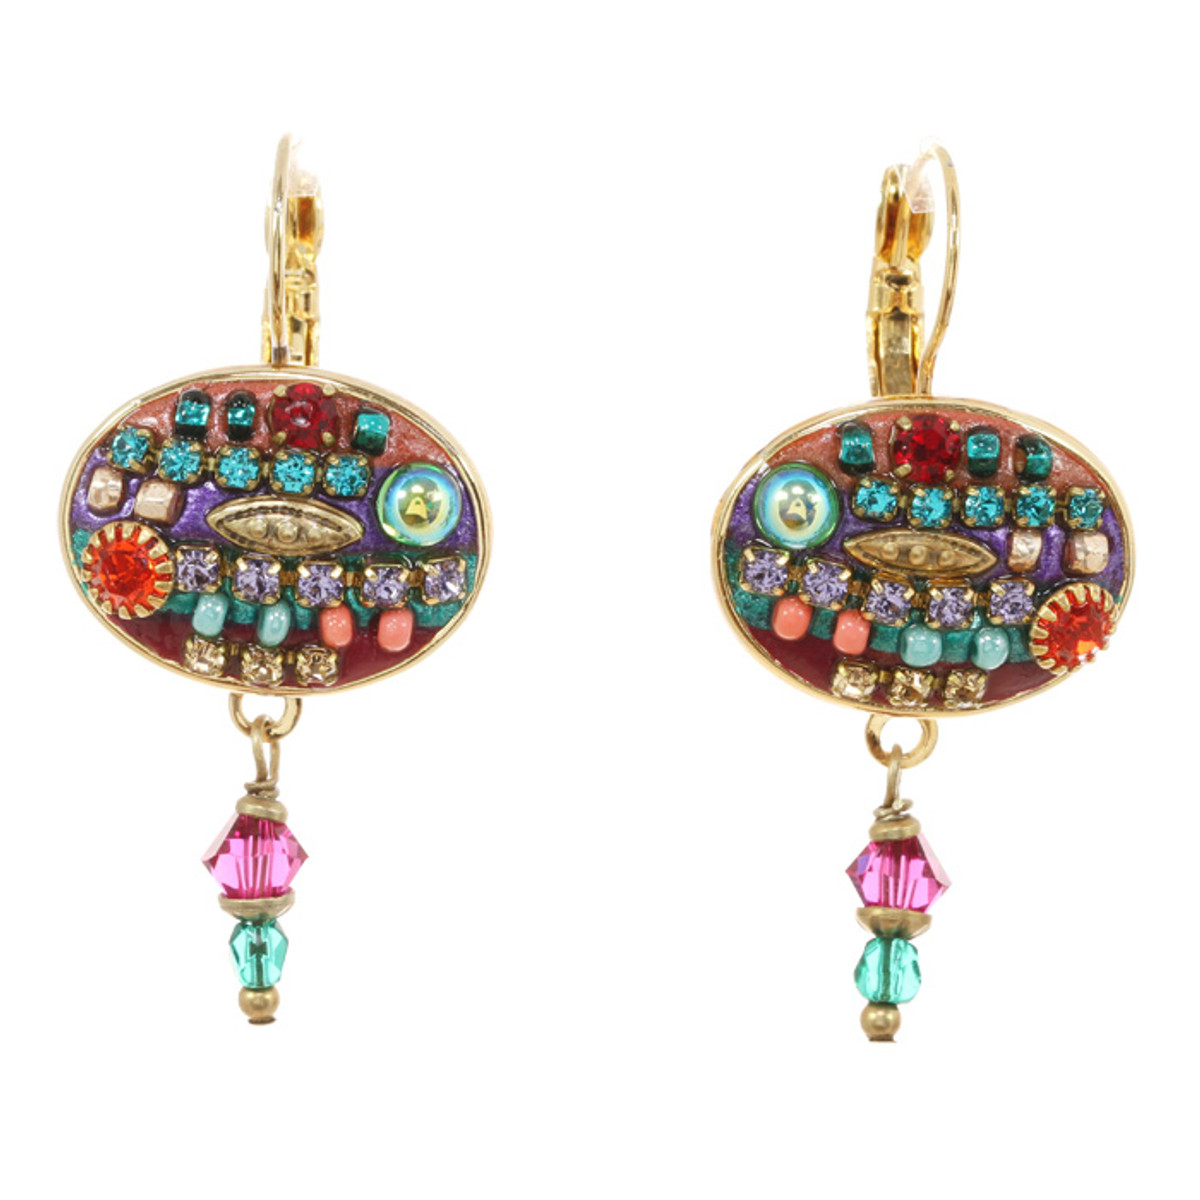 Michal Golan Earrings -Oval Multibright